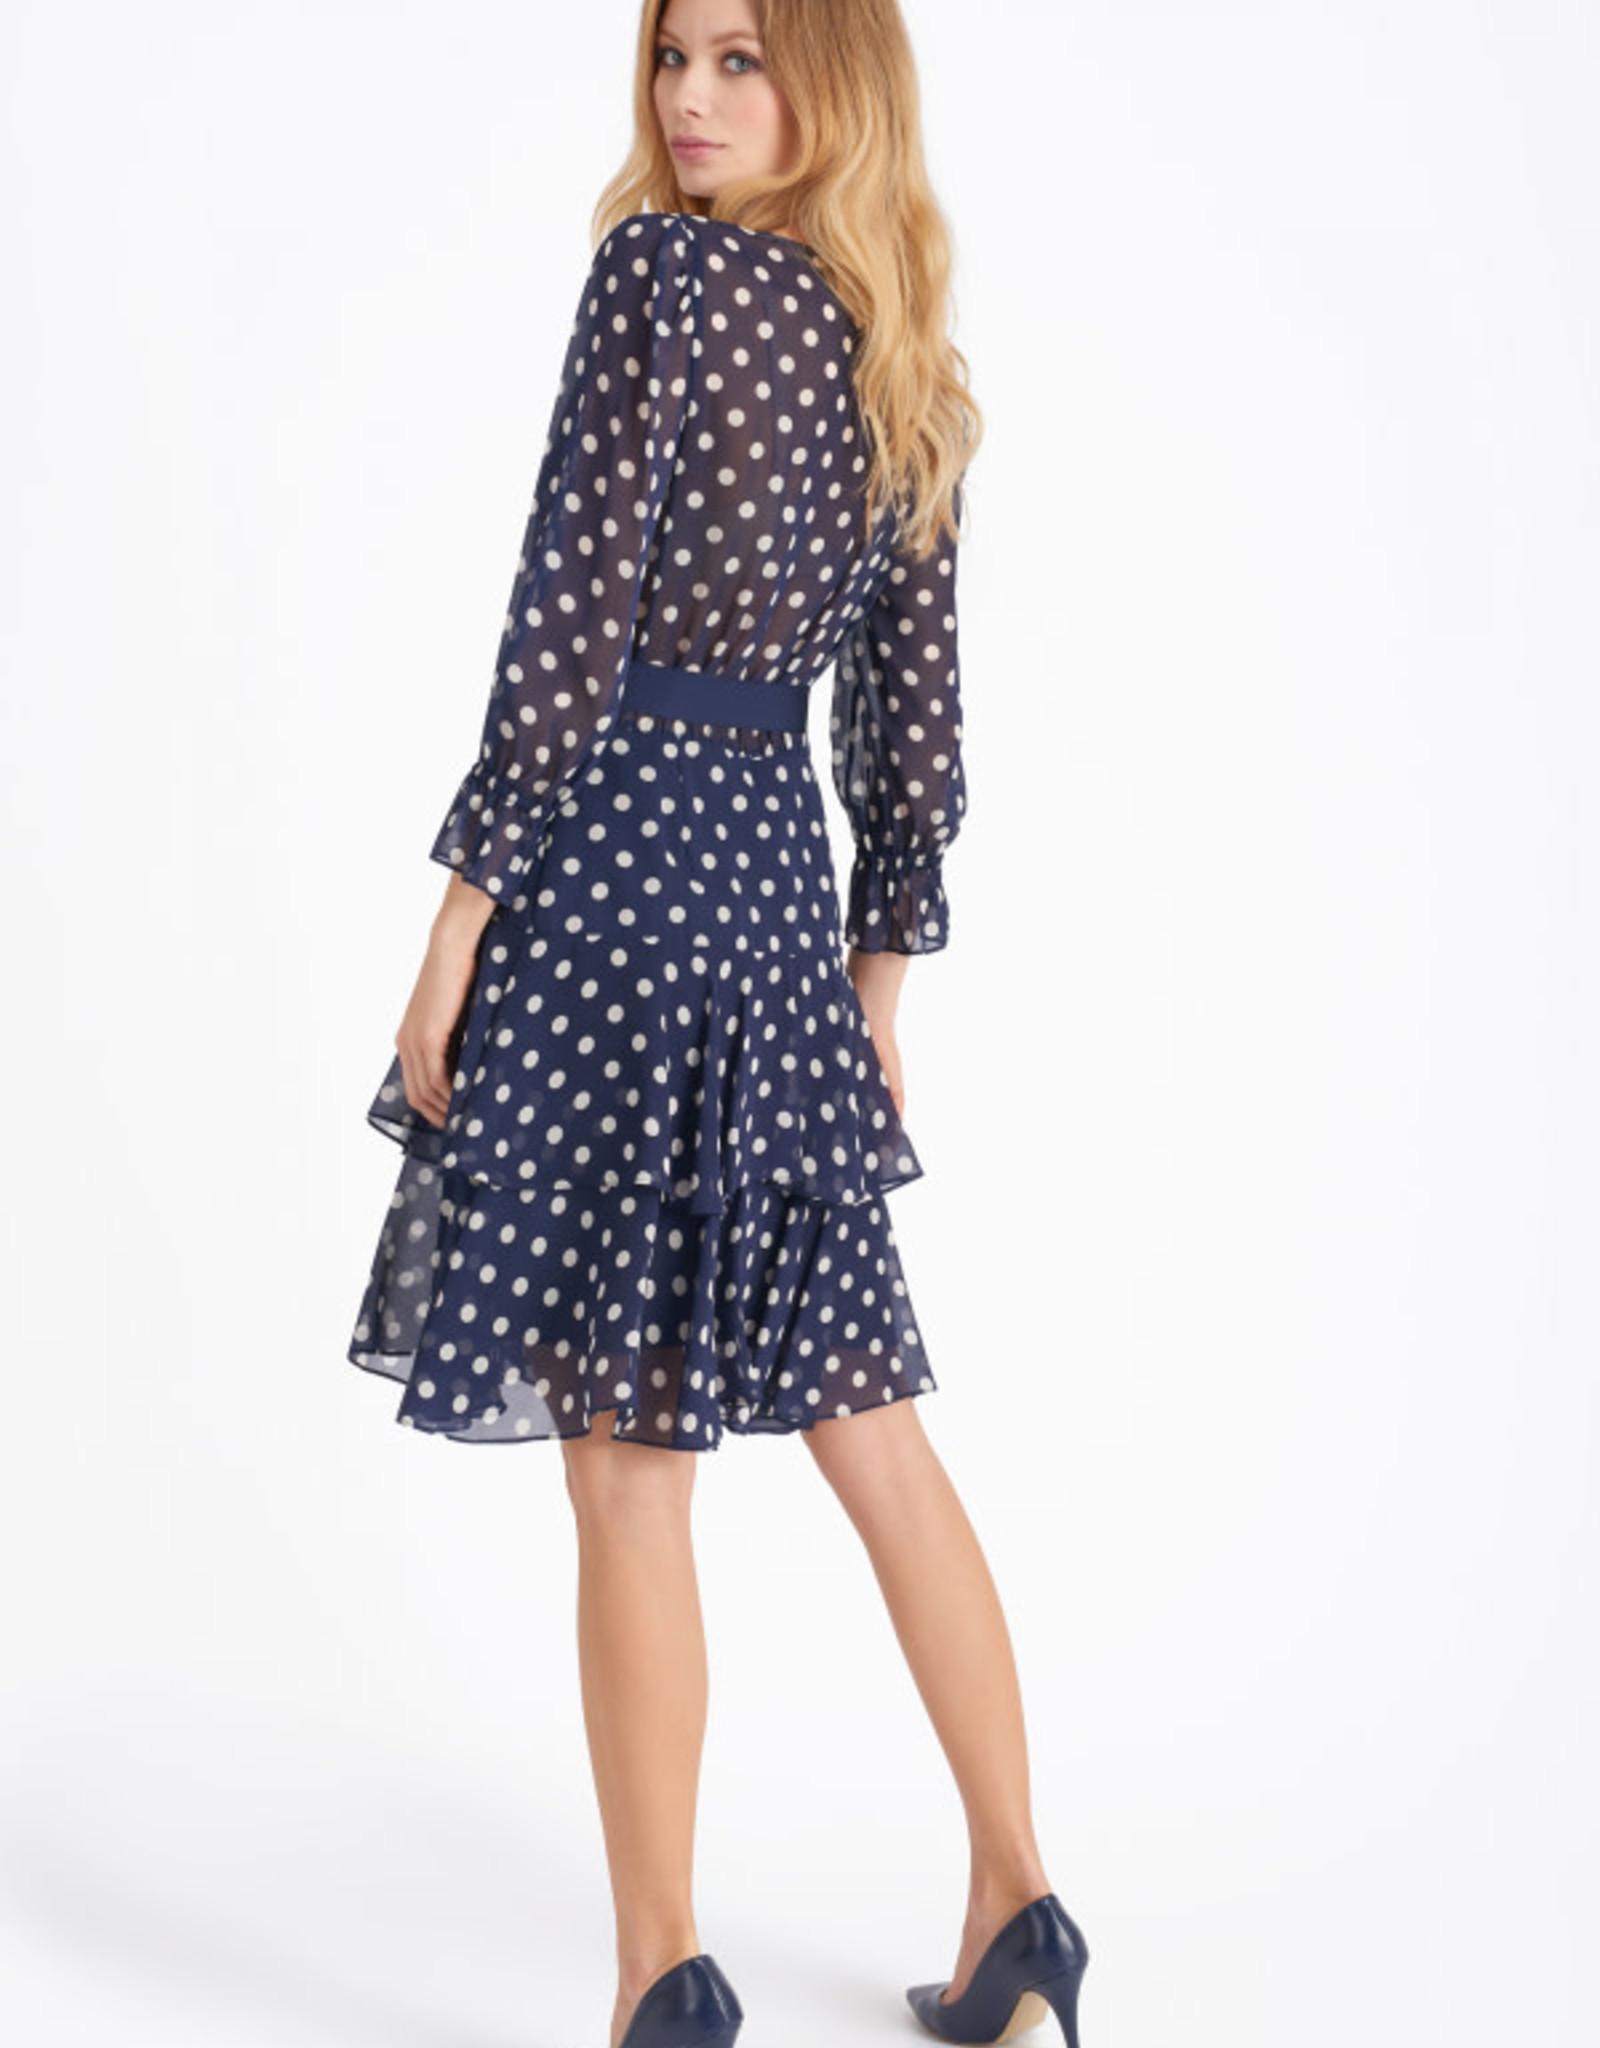 Luisa Spagnoli Printed Viscose Dress